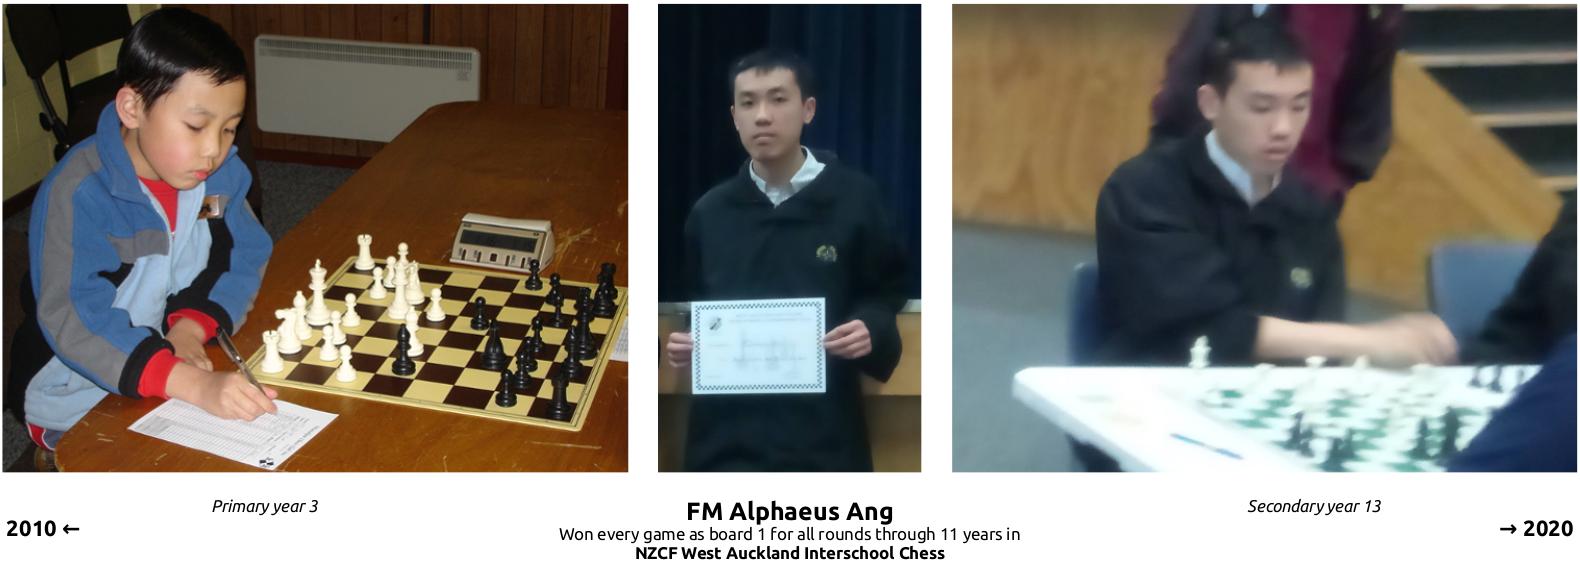 FM Alphaeus Ang photo montage